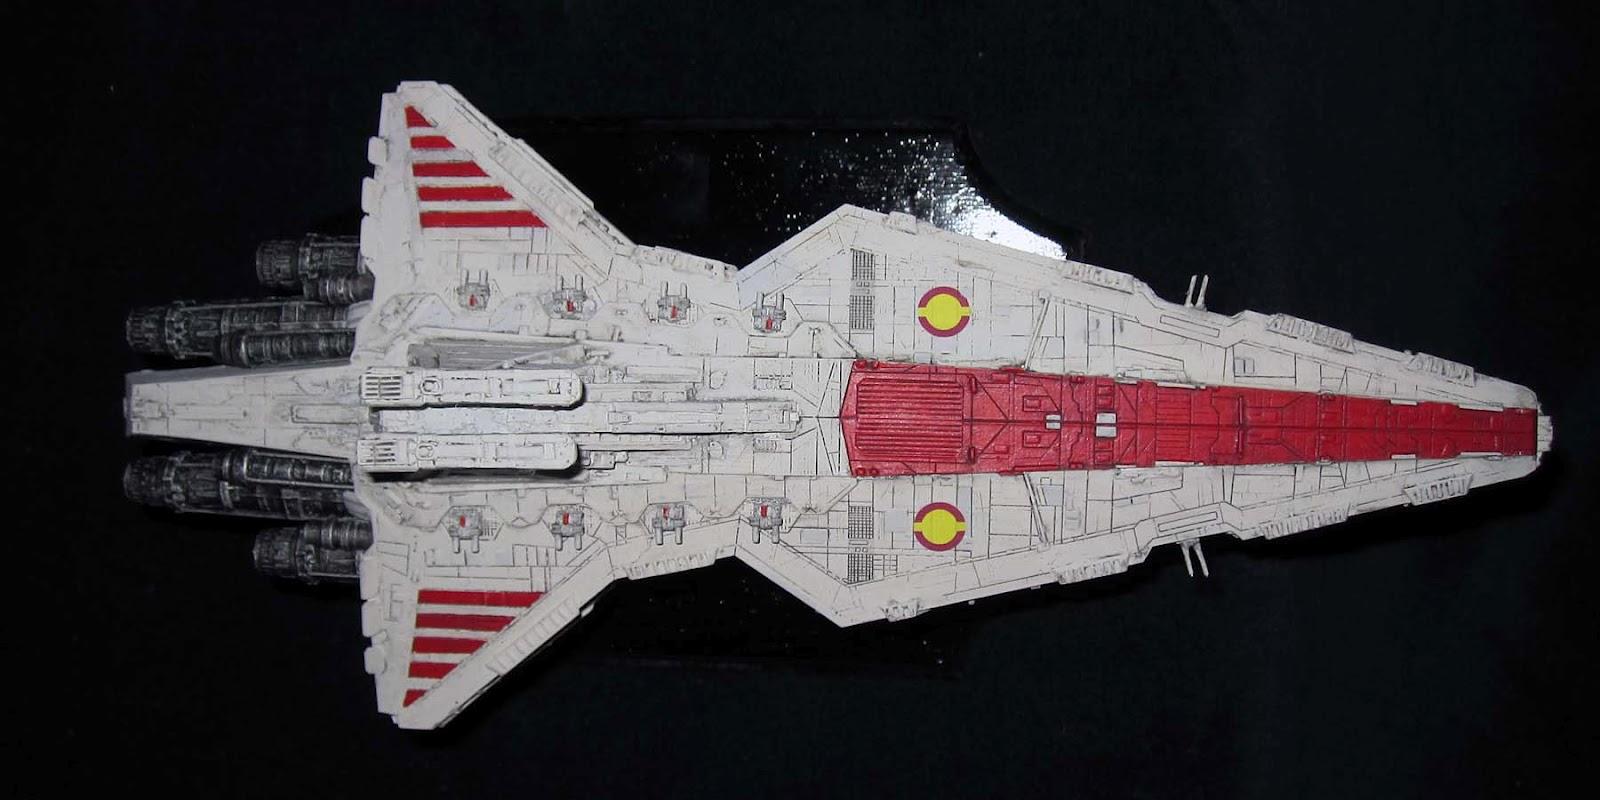 Science Fiction Modeler: Venator Class Republic Star Destroyer